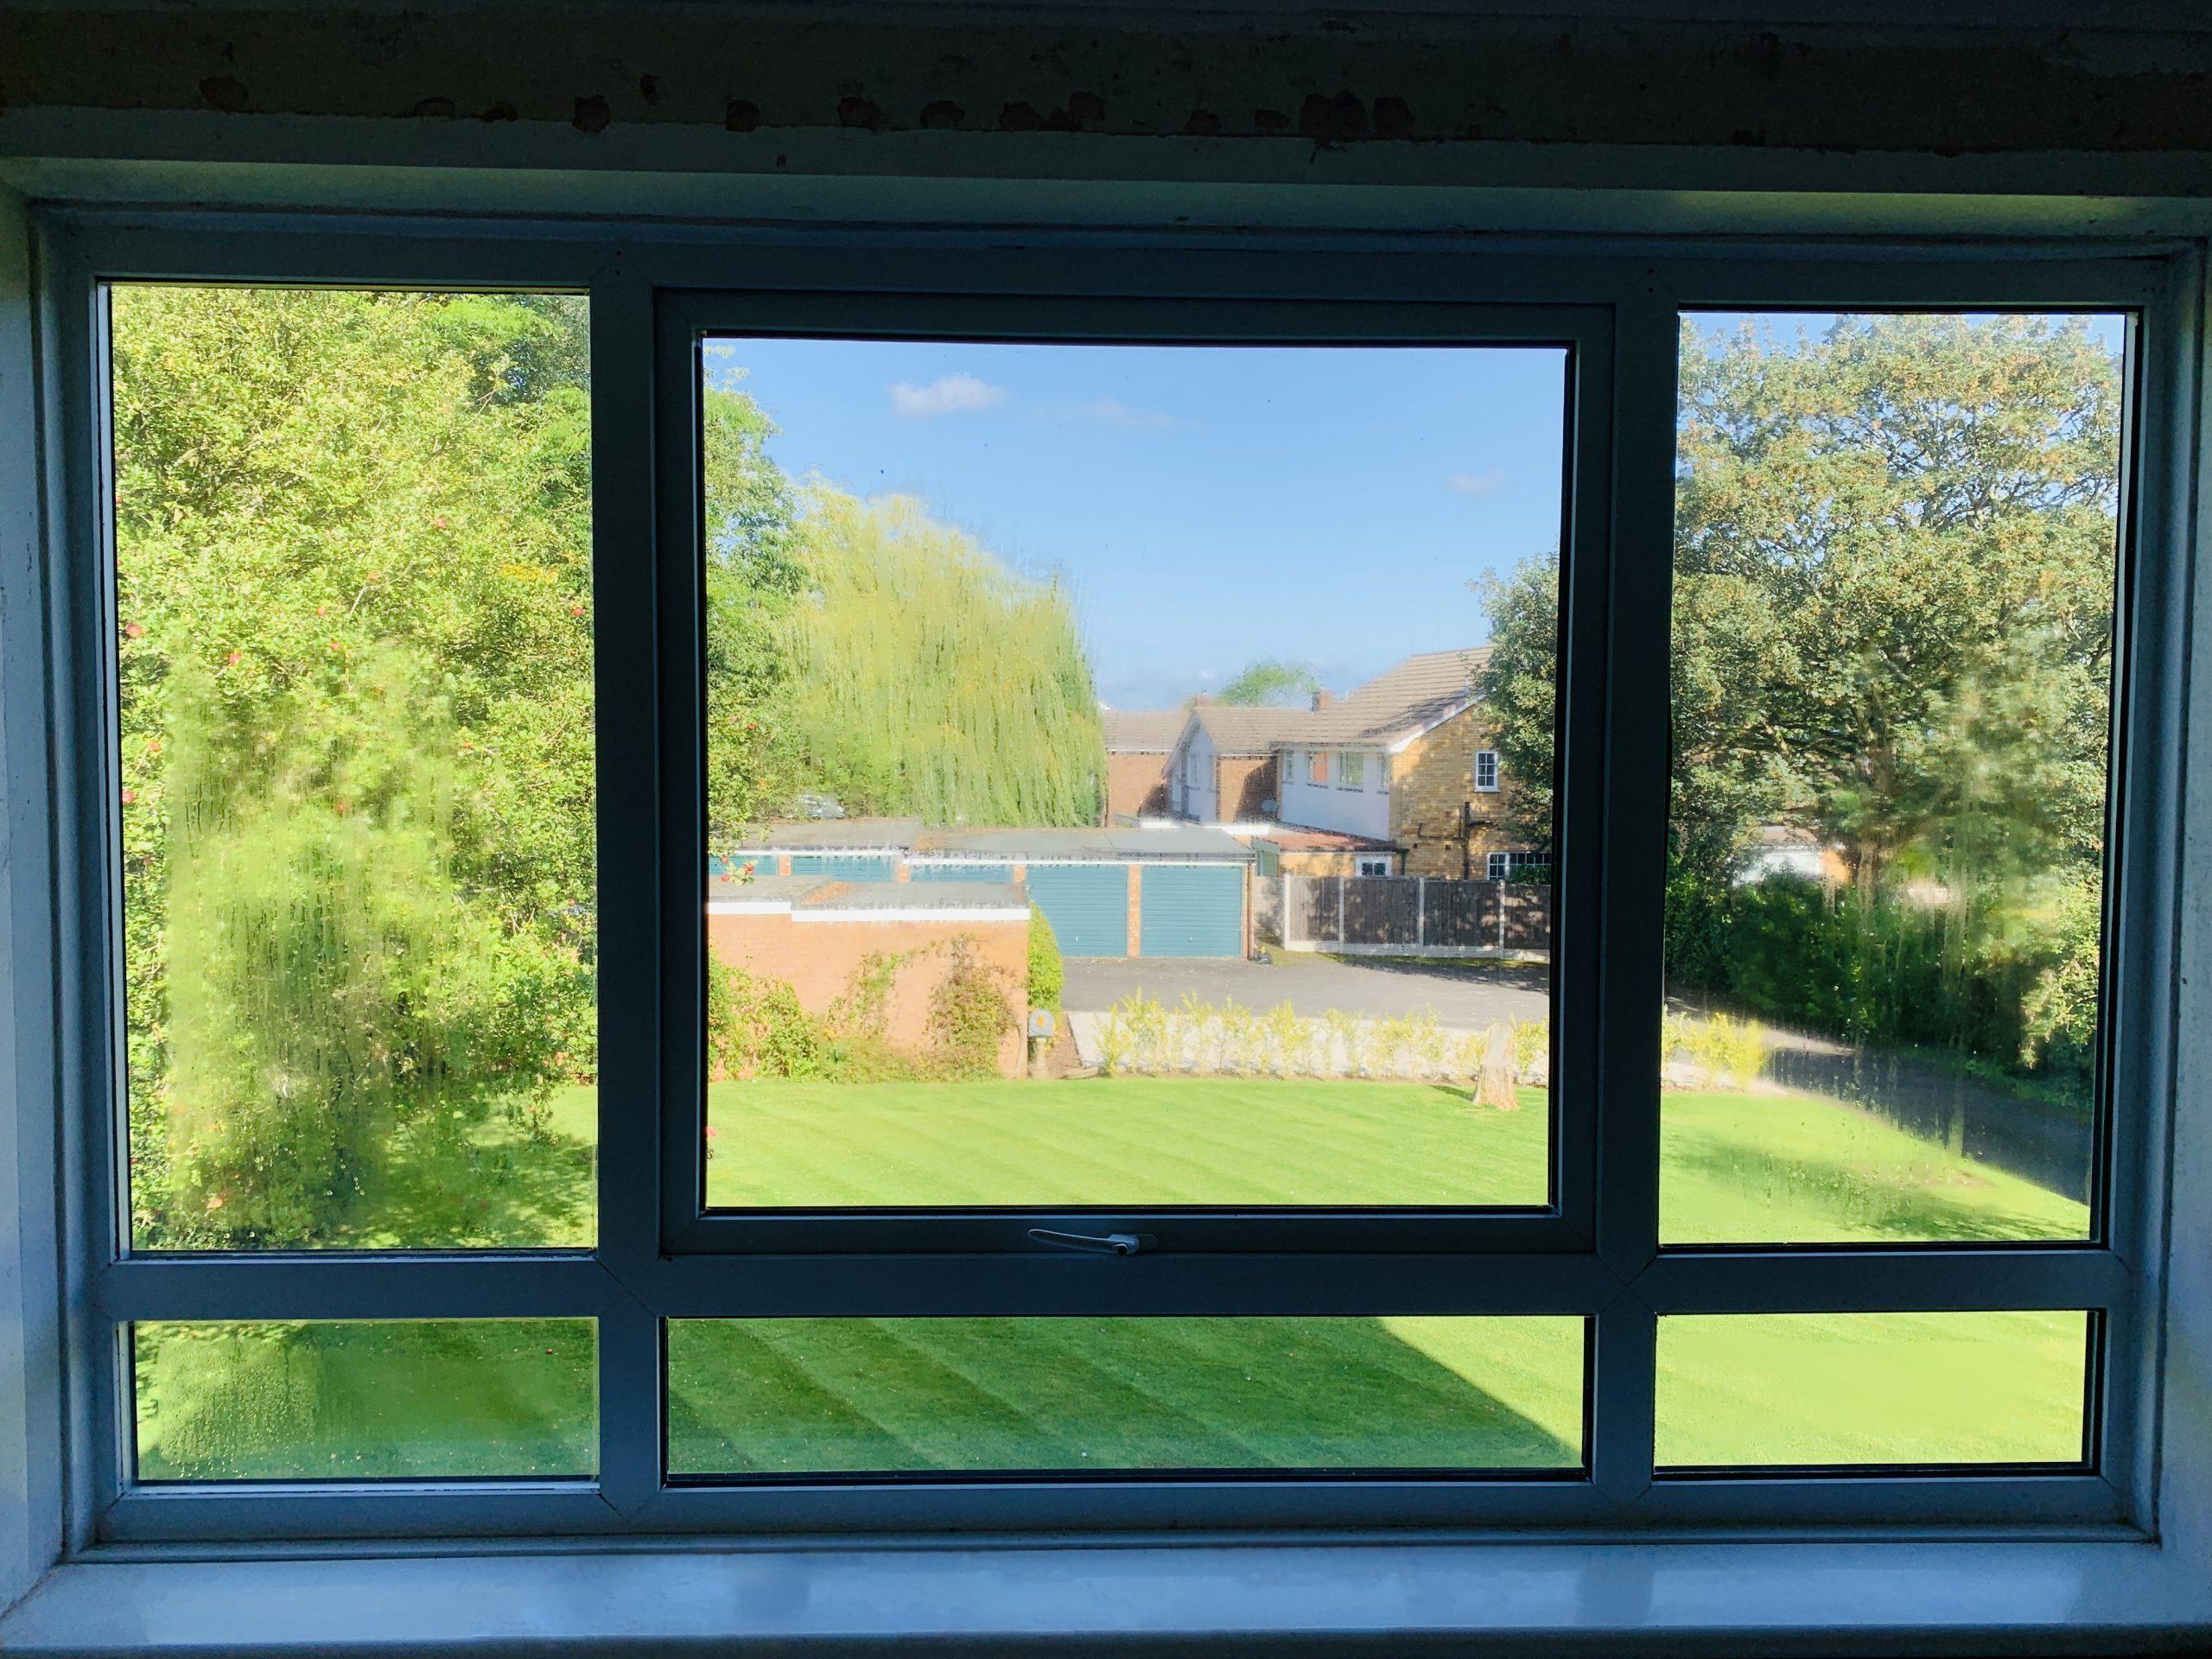 cloudy window replacement birmingham